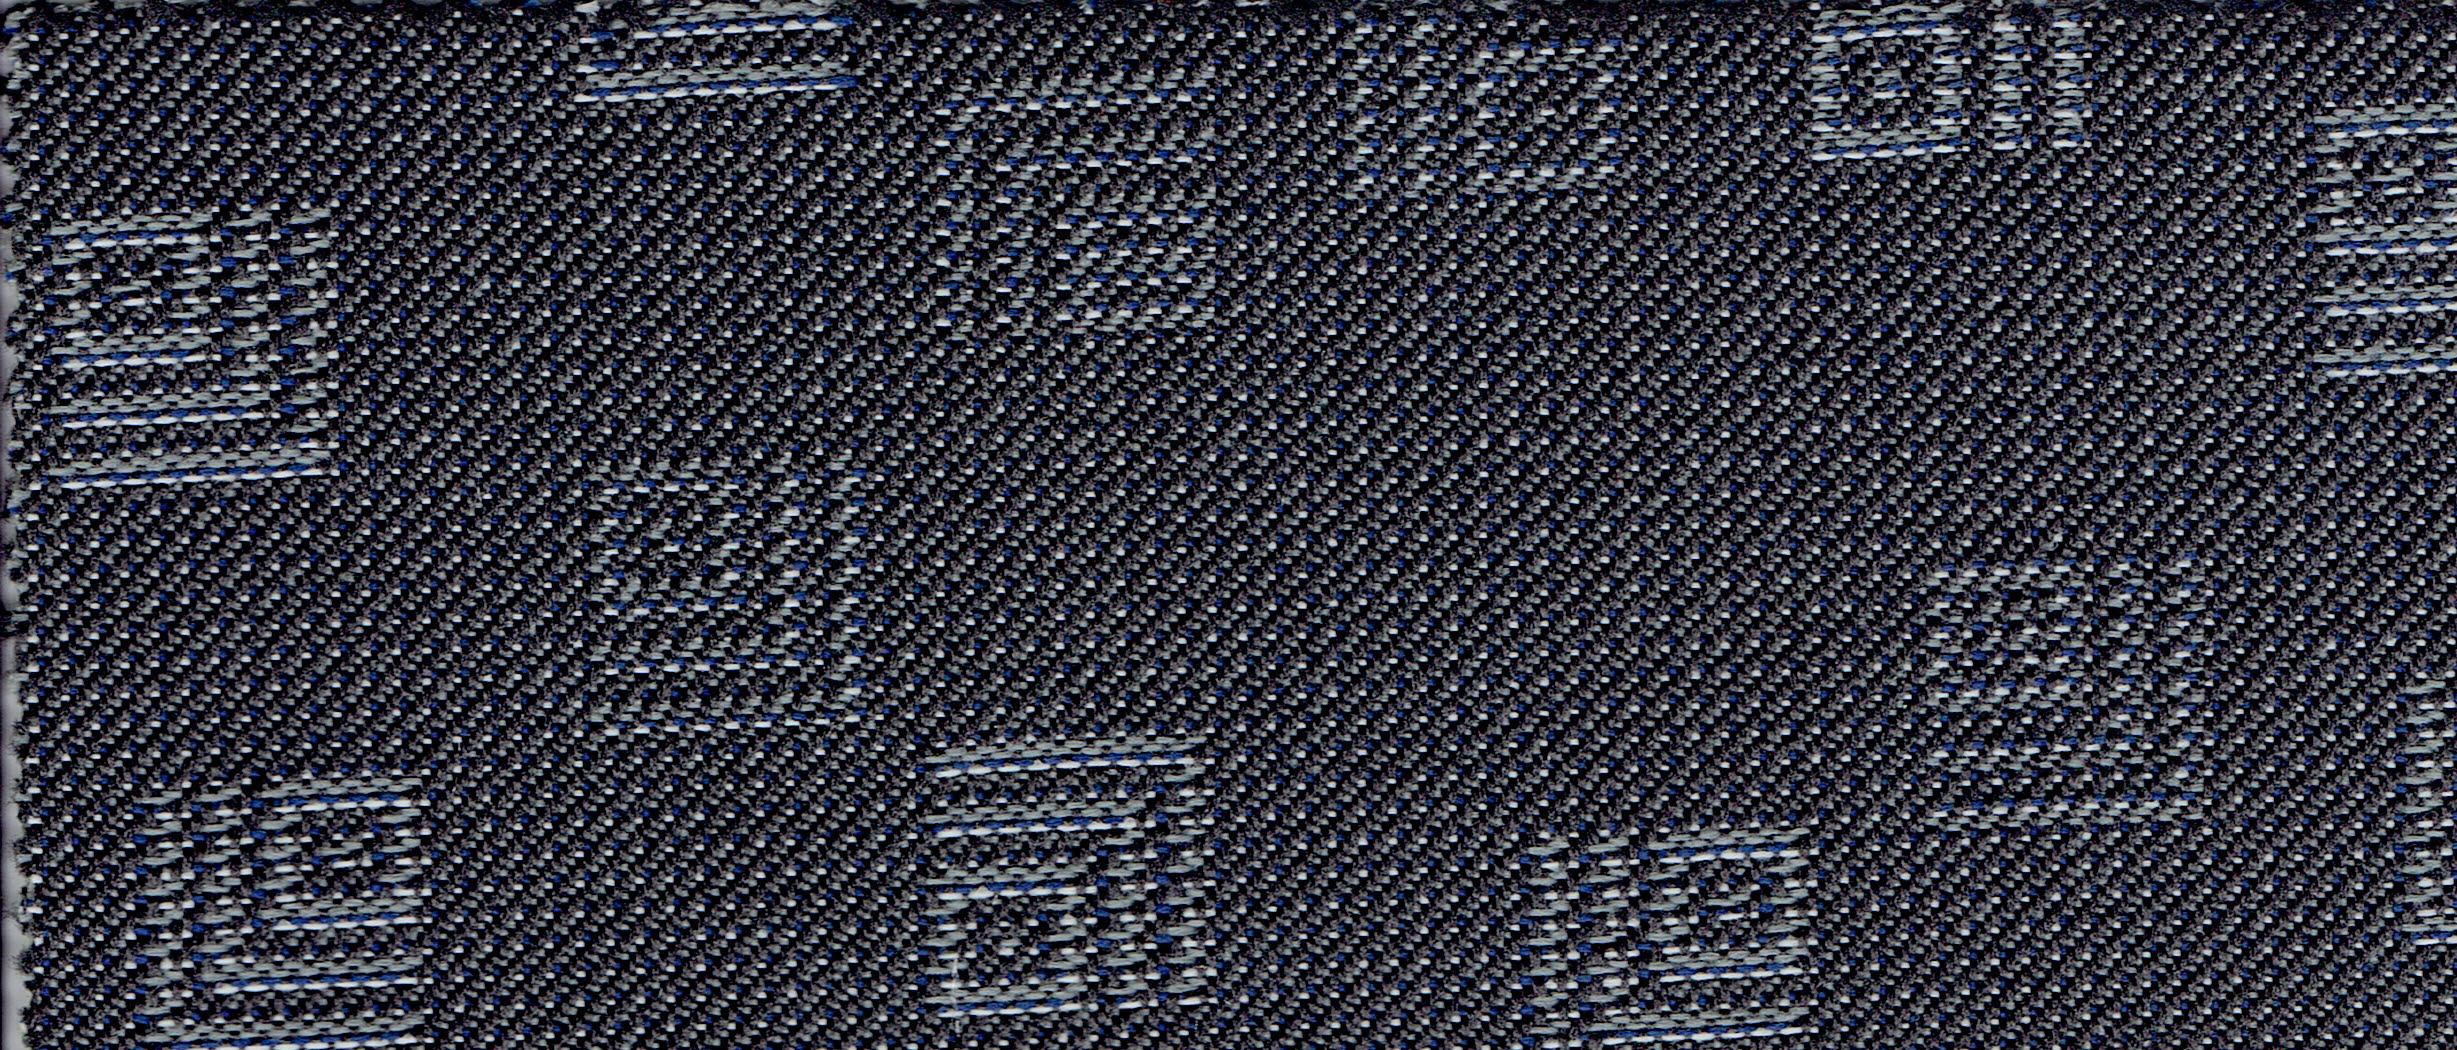 fabric26082015_0004.jpg